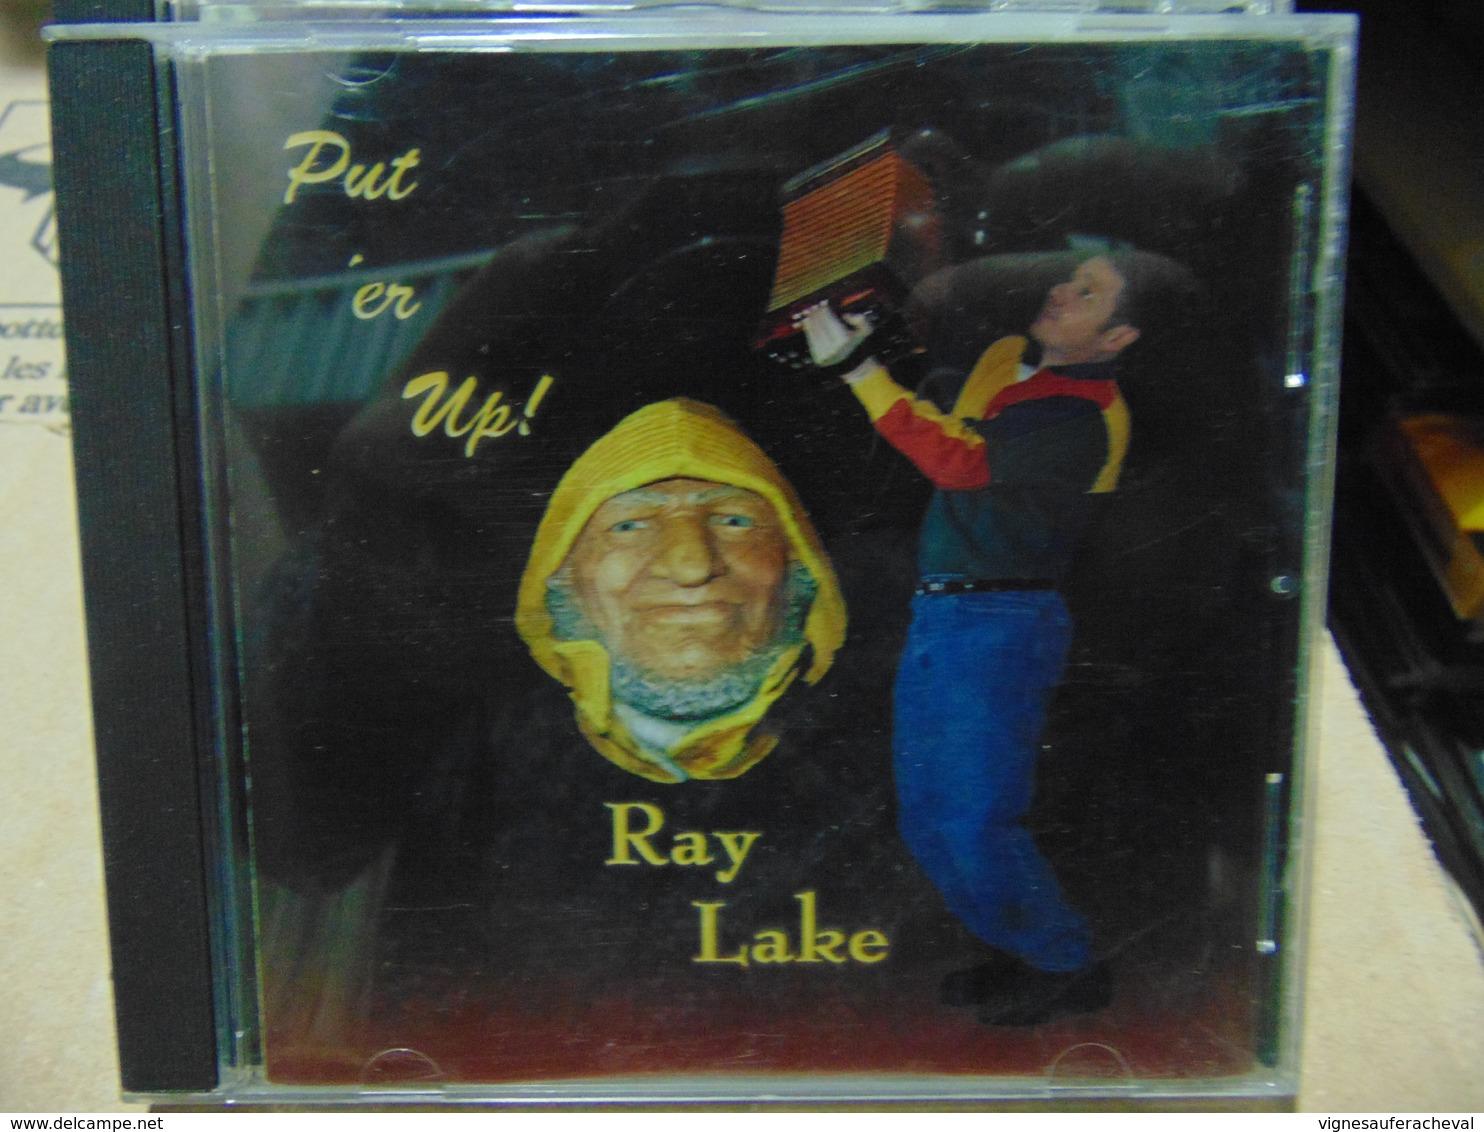 Ray Lake- Put 'em Up! - Other - English Music